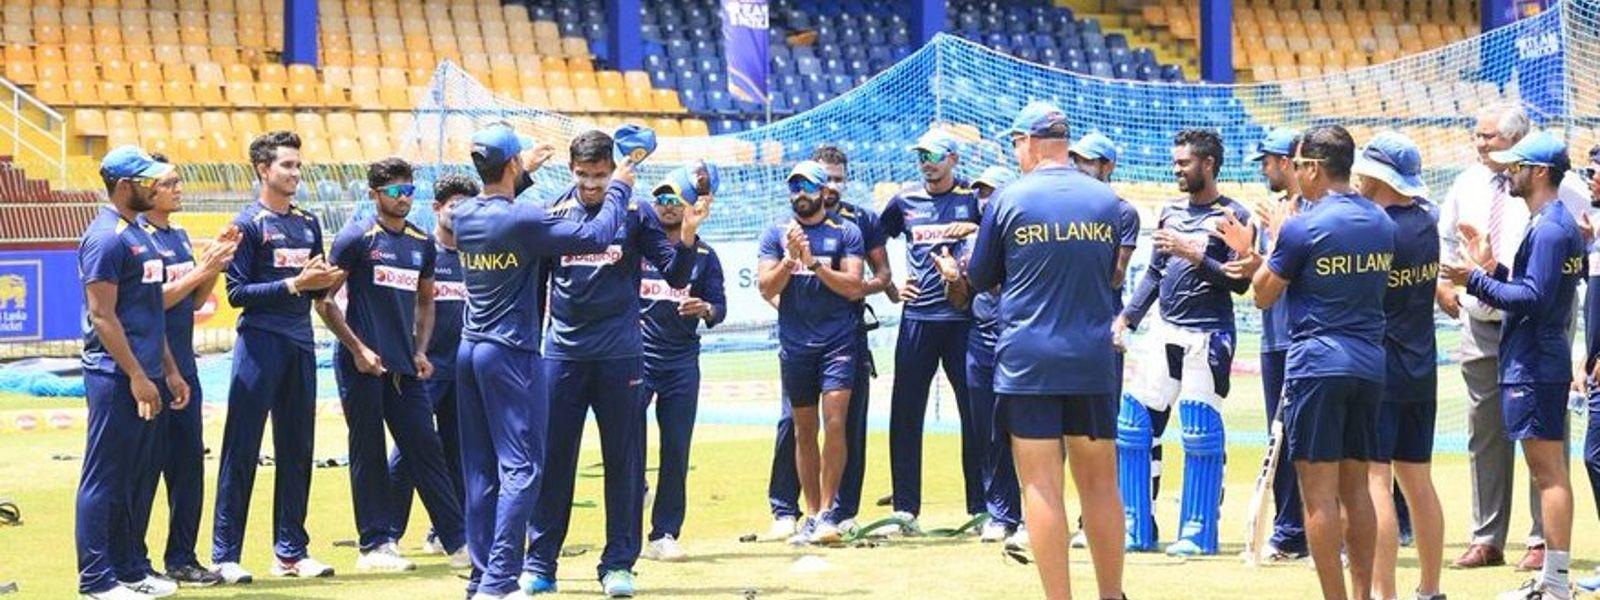 ODI Debut for Maheesh Theekshana – SLs 1st International Player born in 21st Century